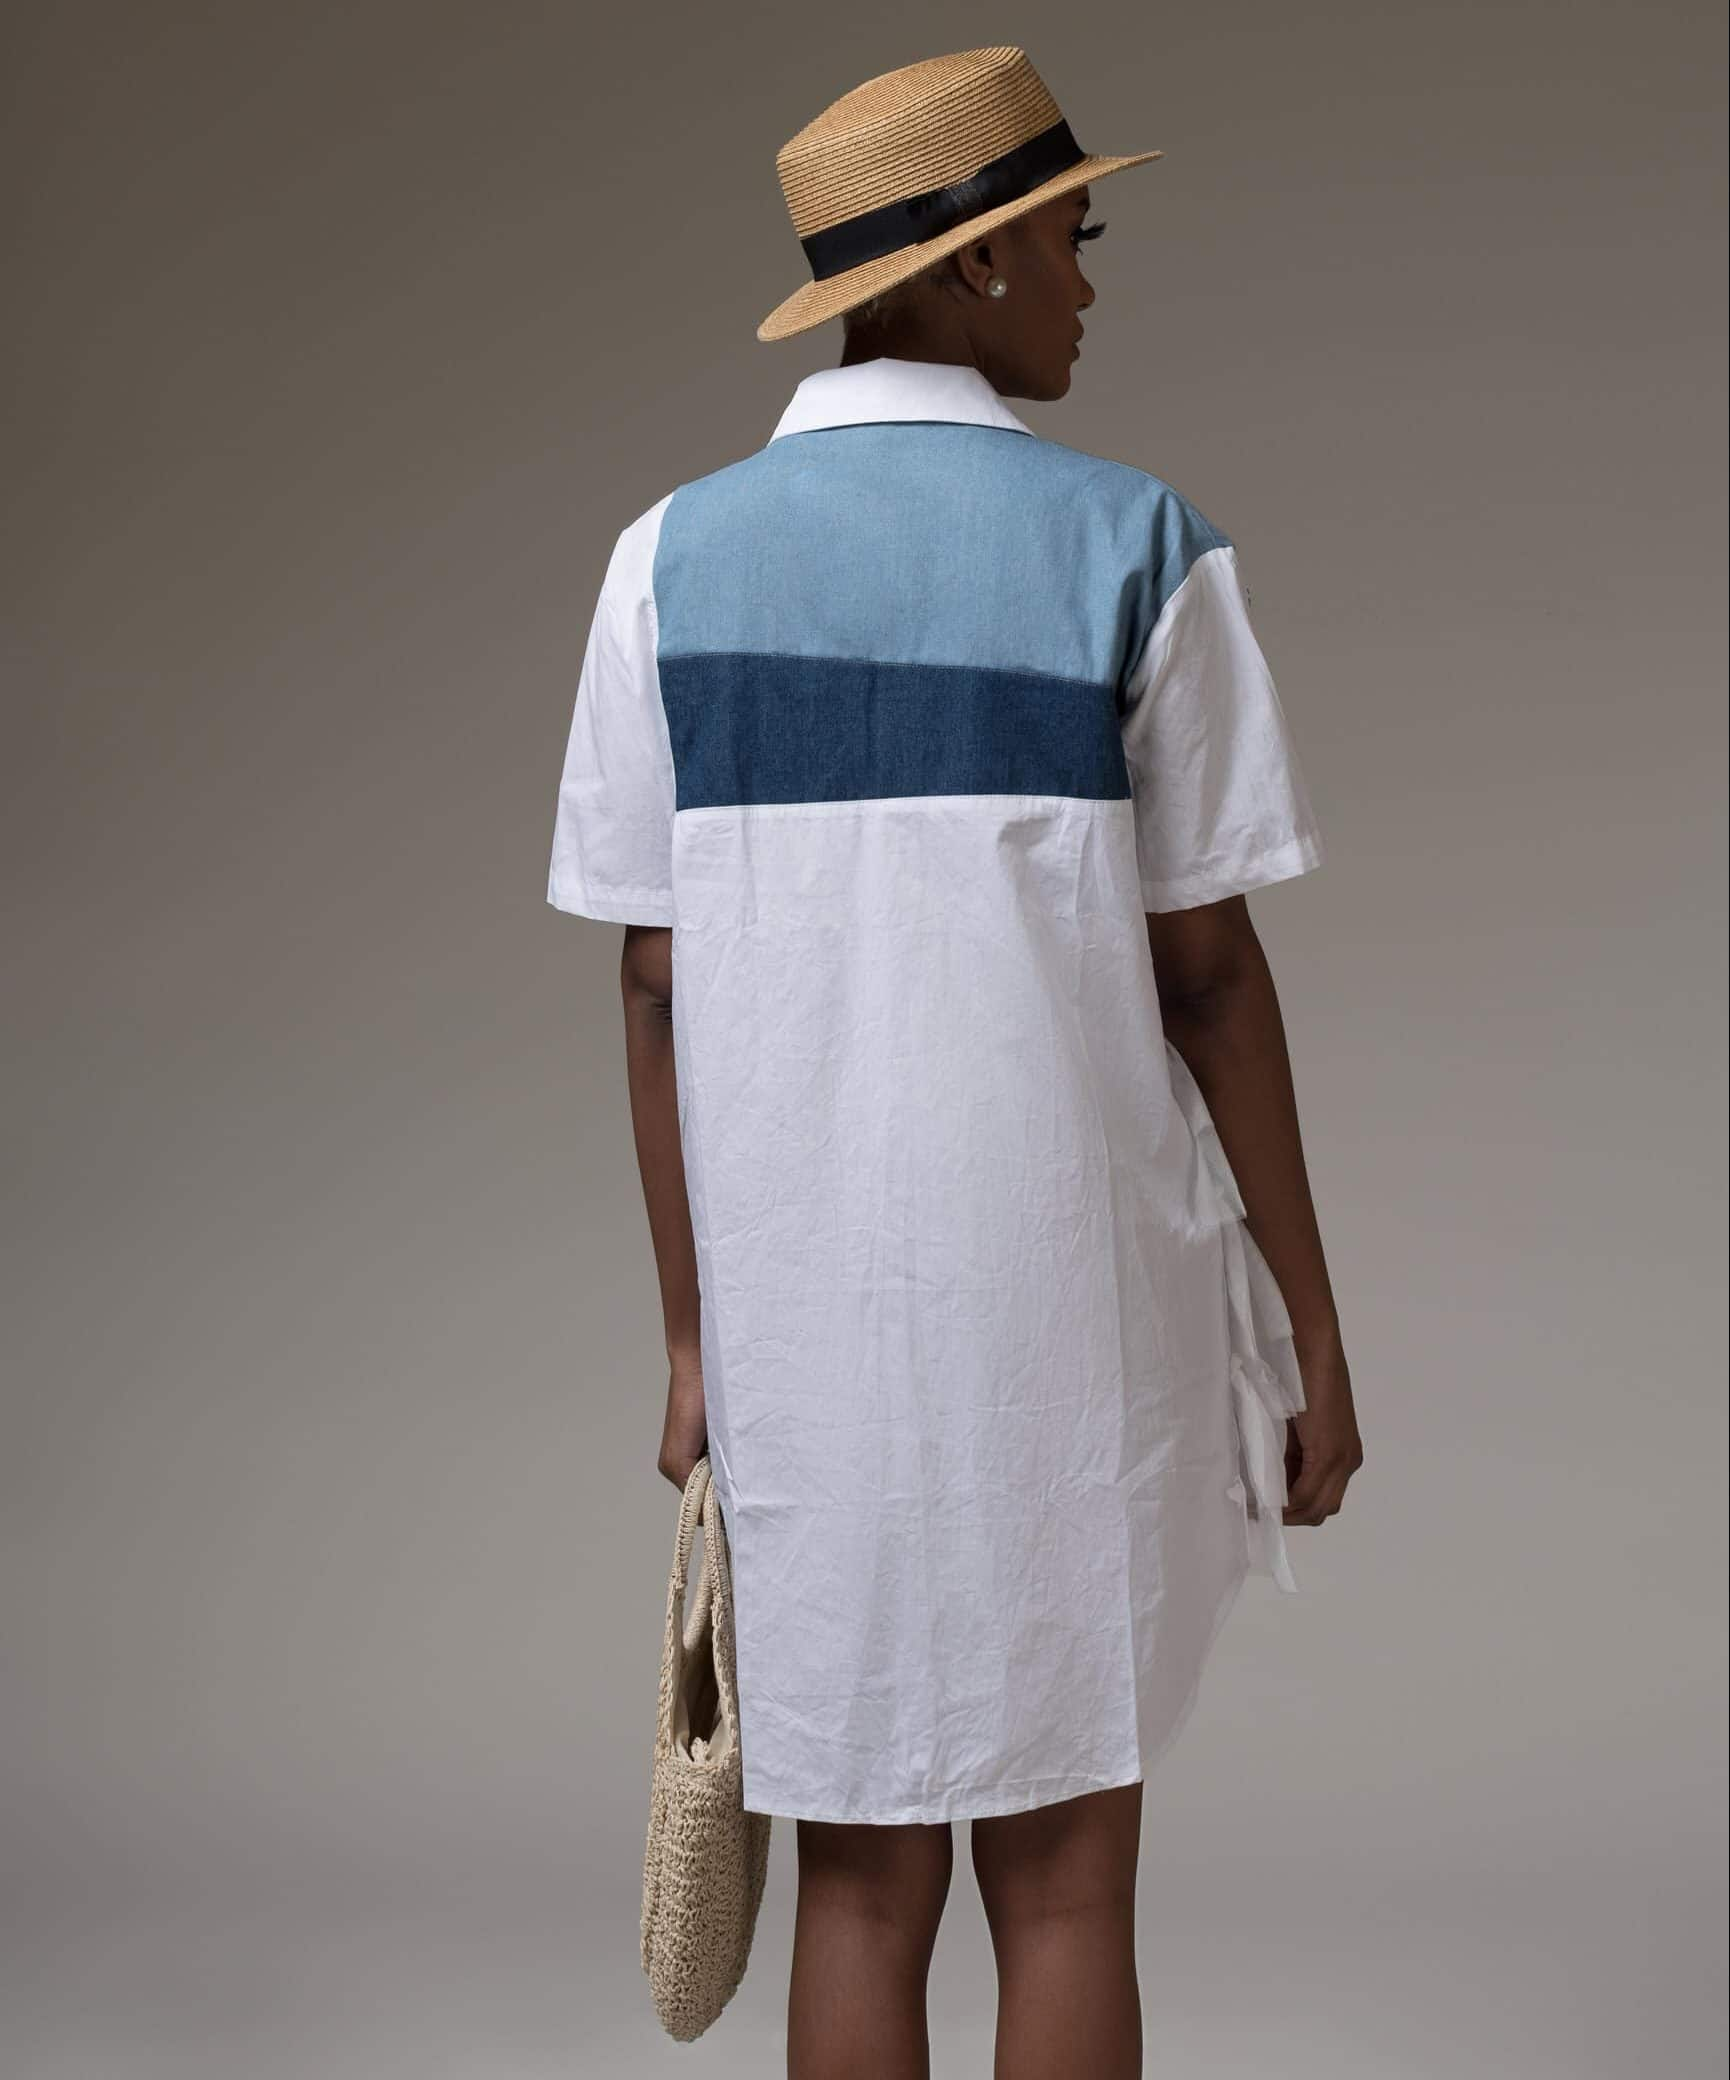 Farewell 2019 Embellished Denim and White Embellished Shirt Dress